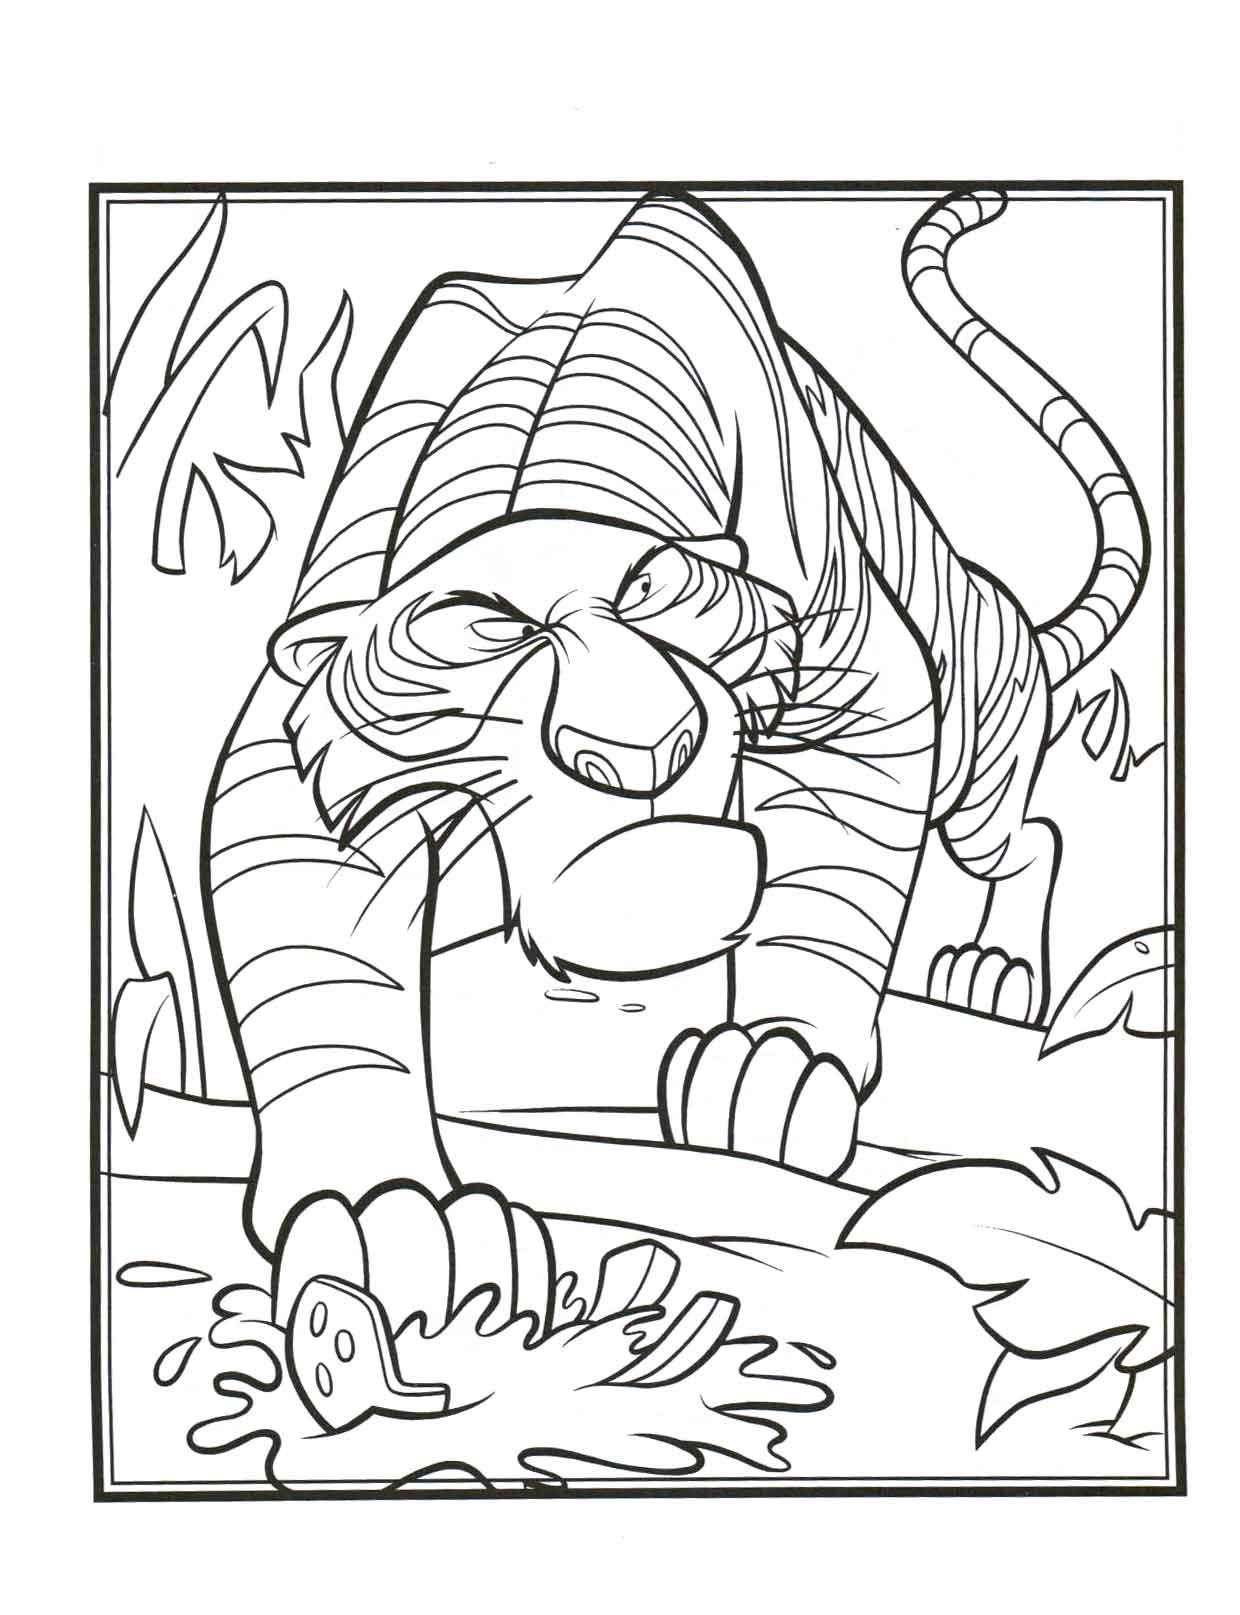 Coloriage shere khan livre de la jungle imprimer - Dessin livre de la jungle ...